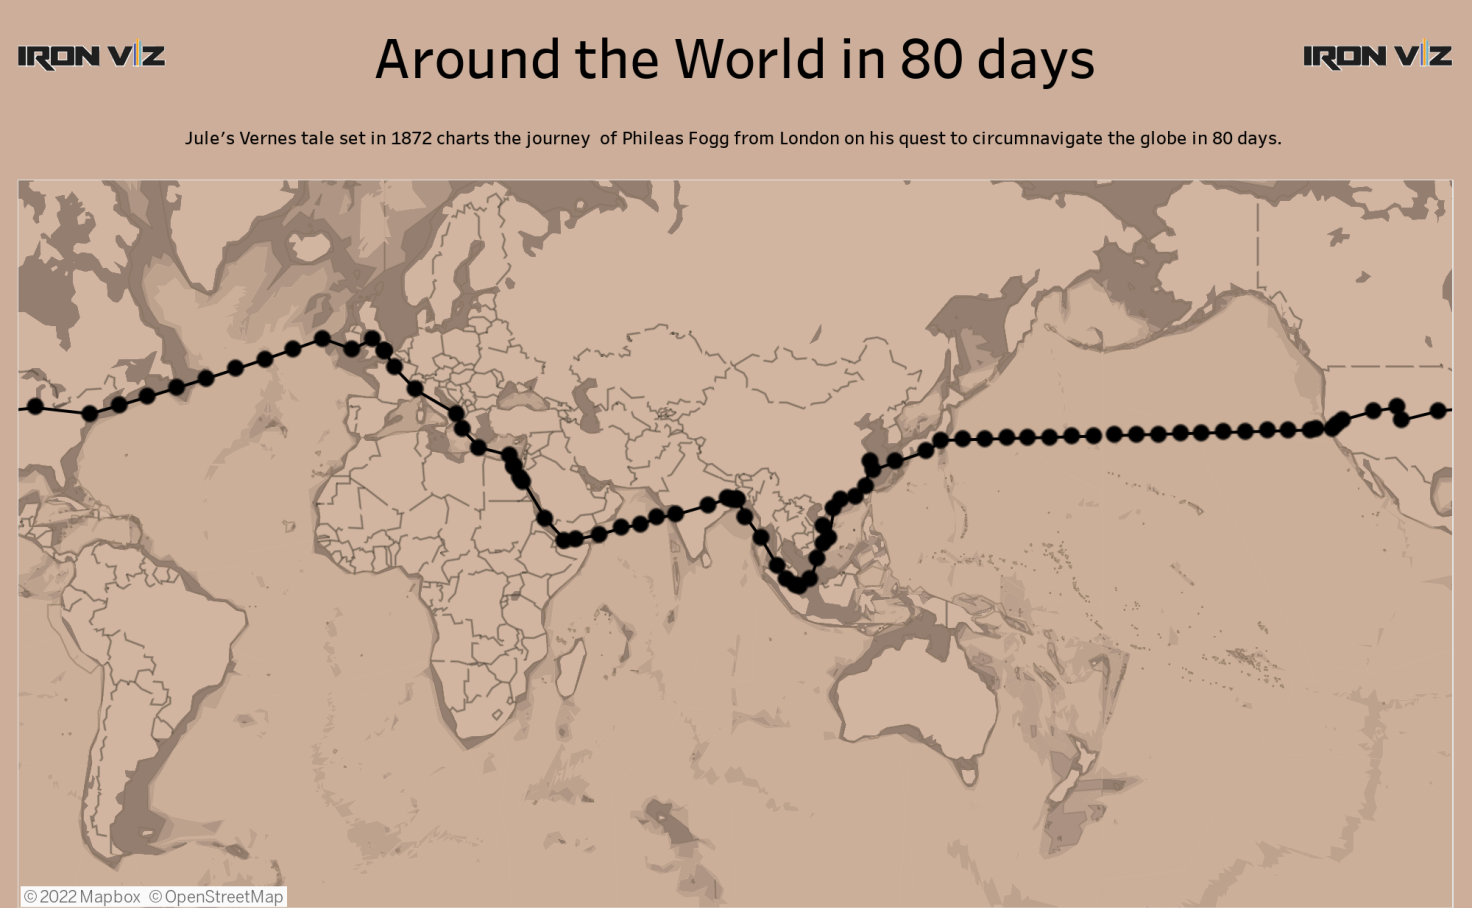 Around the world in 80 days - Ali Motion | Tableau Public